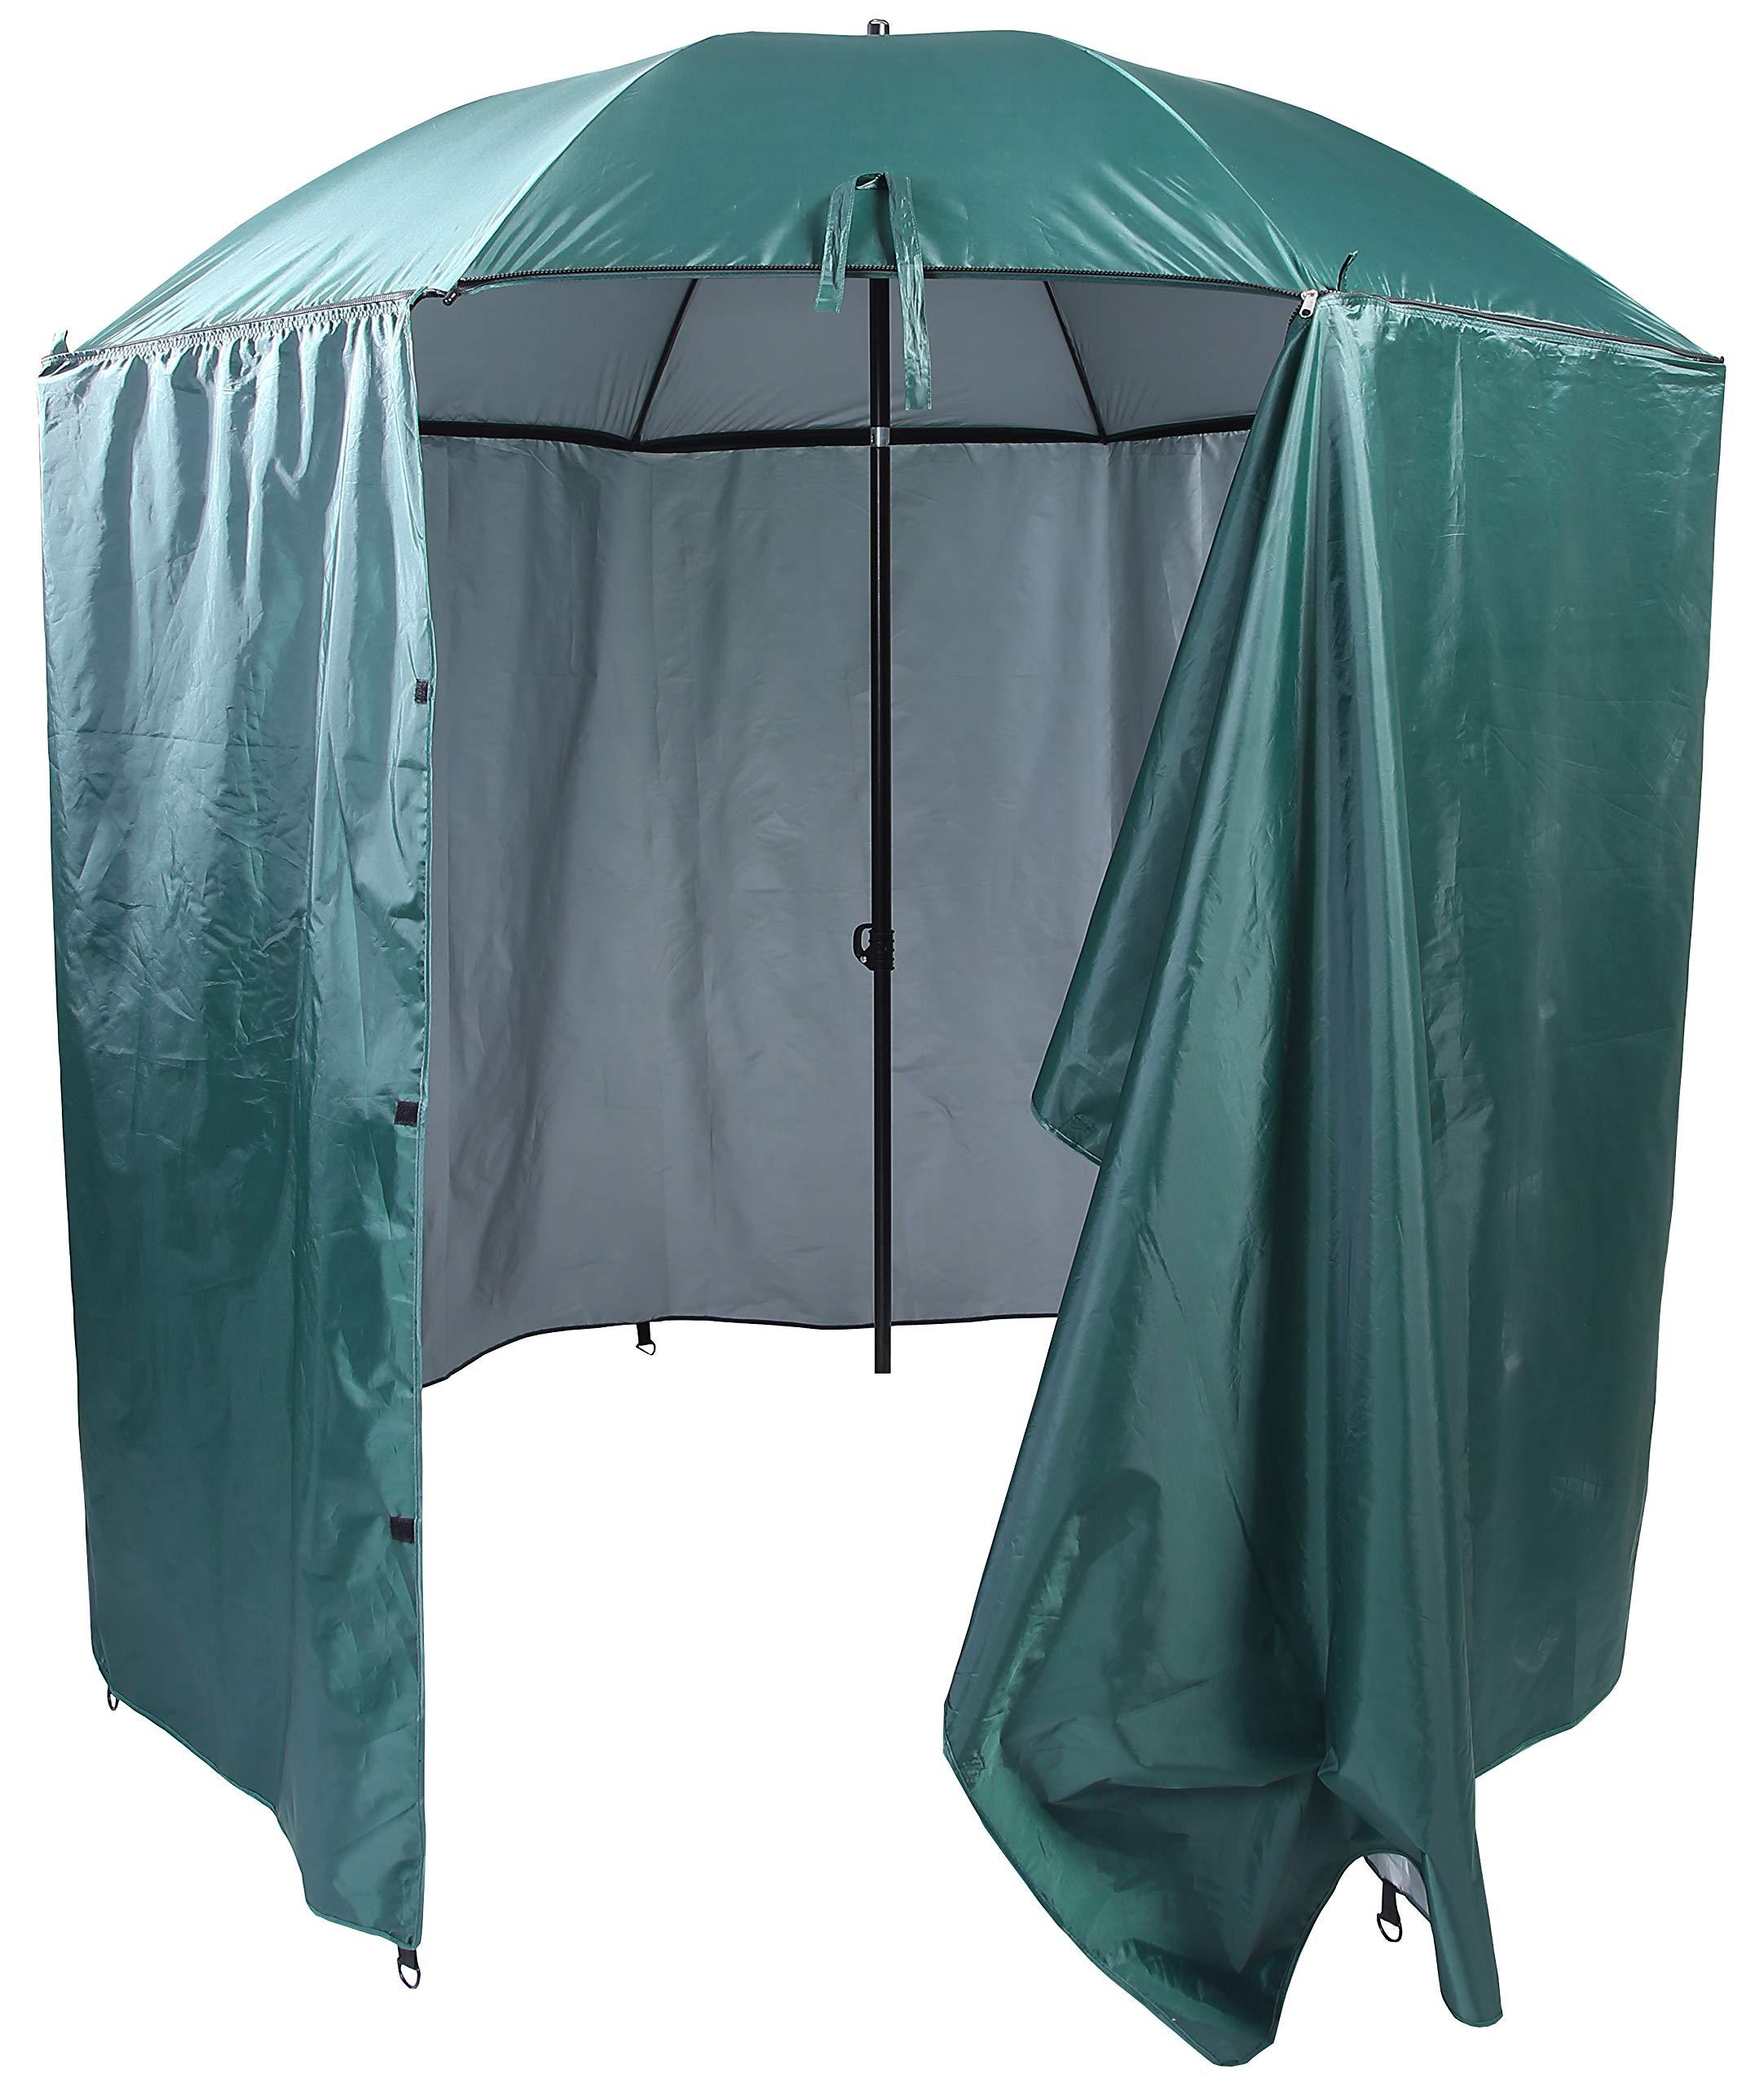 DDYOUTDOOR Portable Waterproof Camping Beach Fishing Picnic Shade Tent Canopy Umbrella Sunshade Cabana Sun Shelter (Dark Green) by DDYOUTDOOR